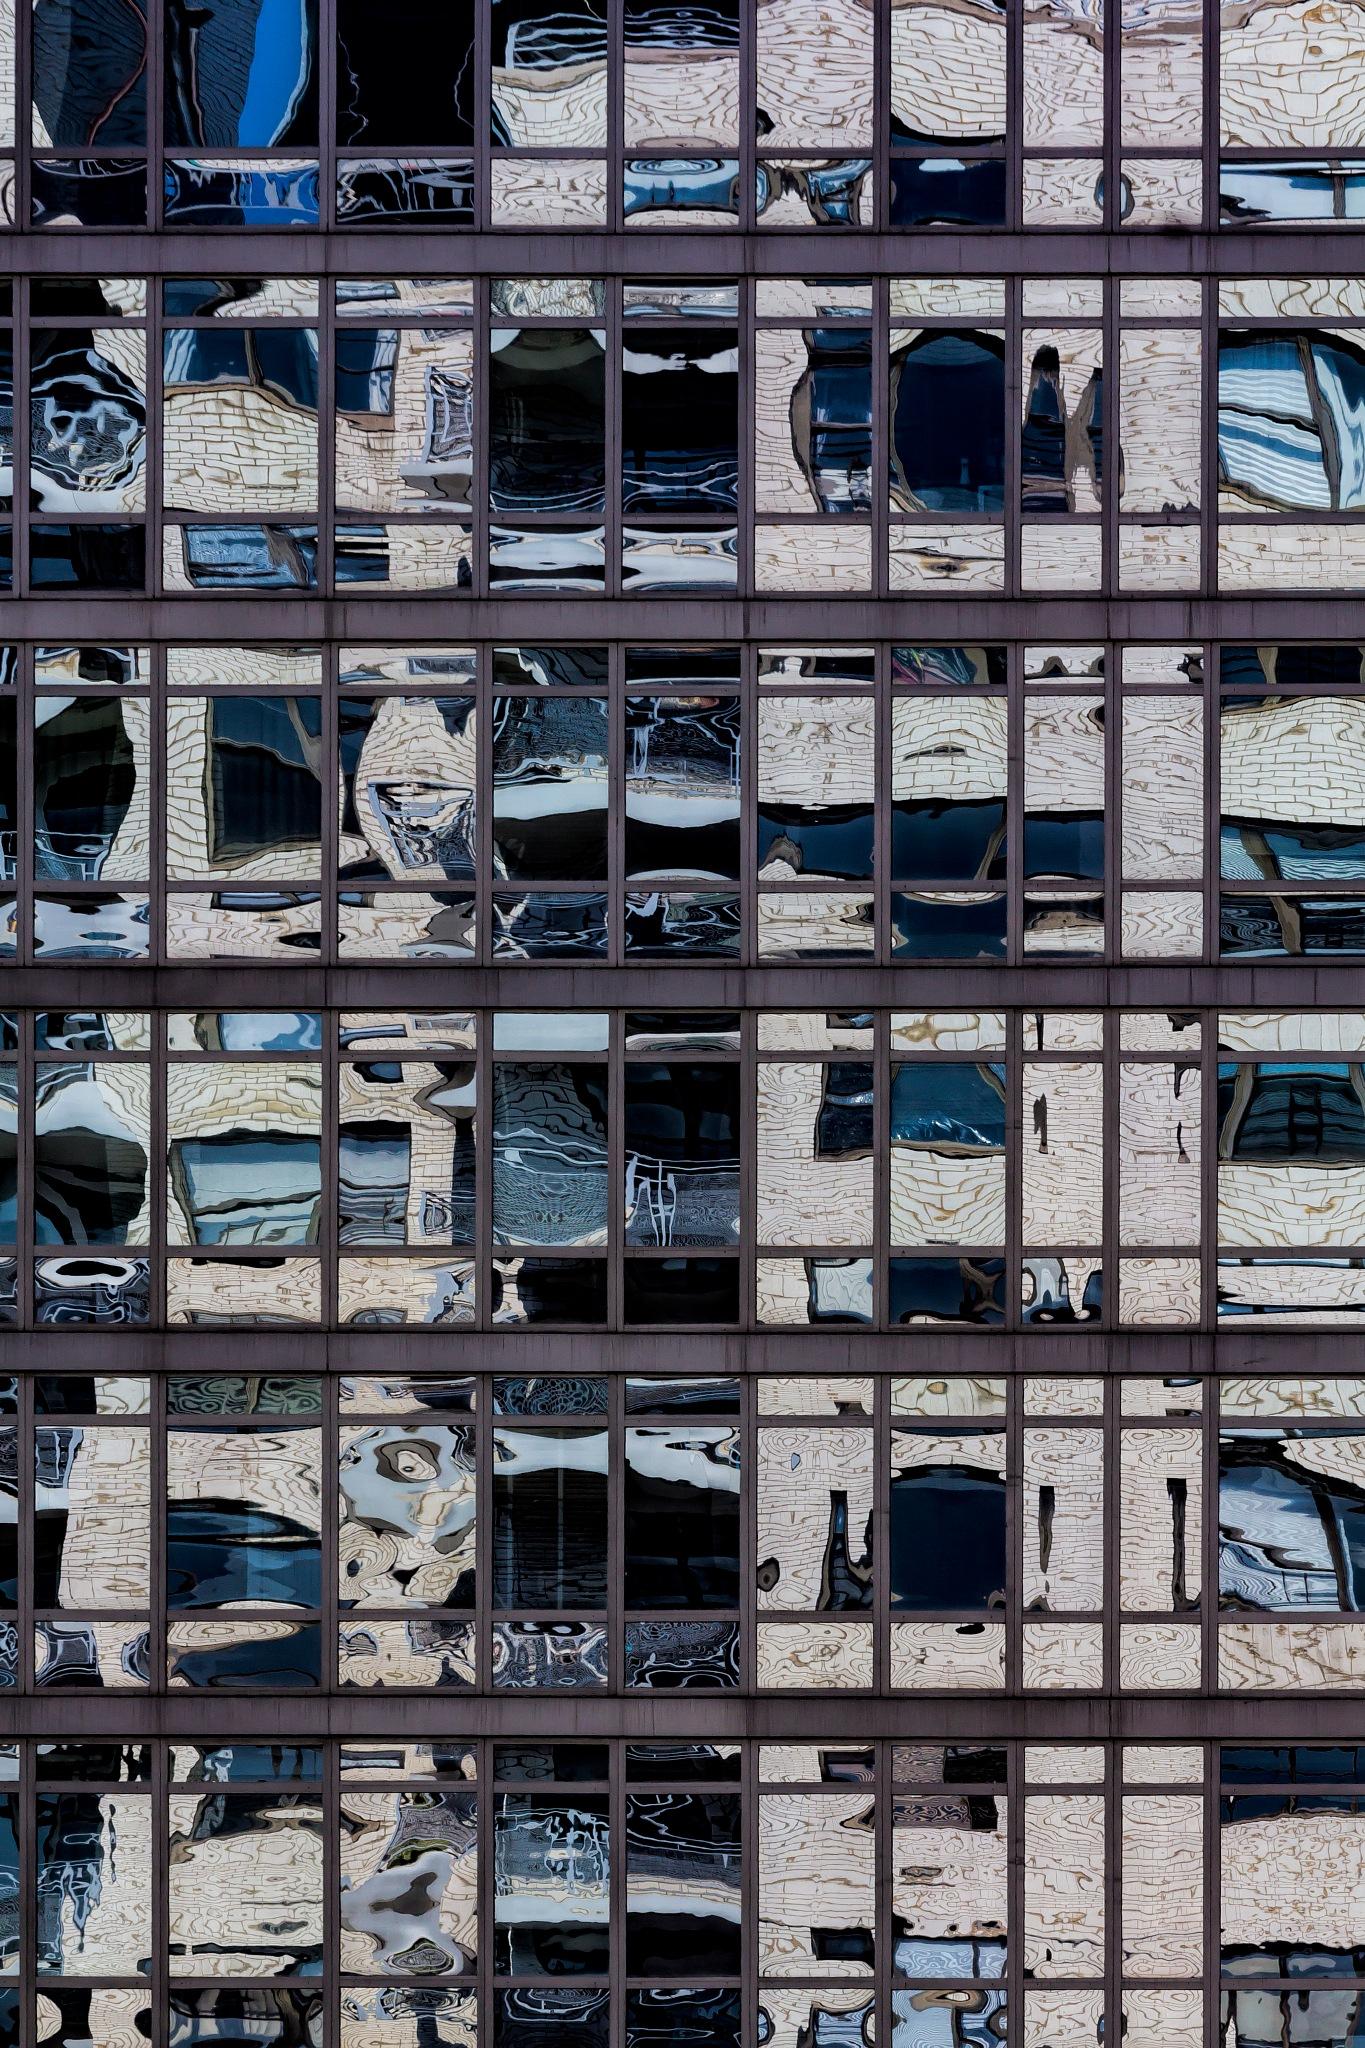 Reflective Windows by robertullmann